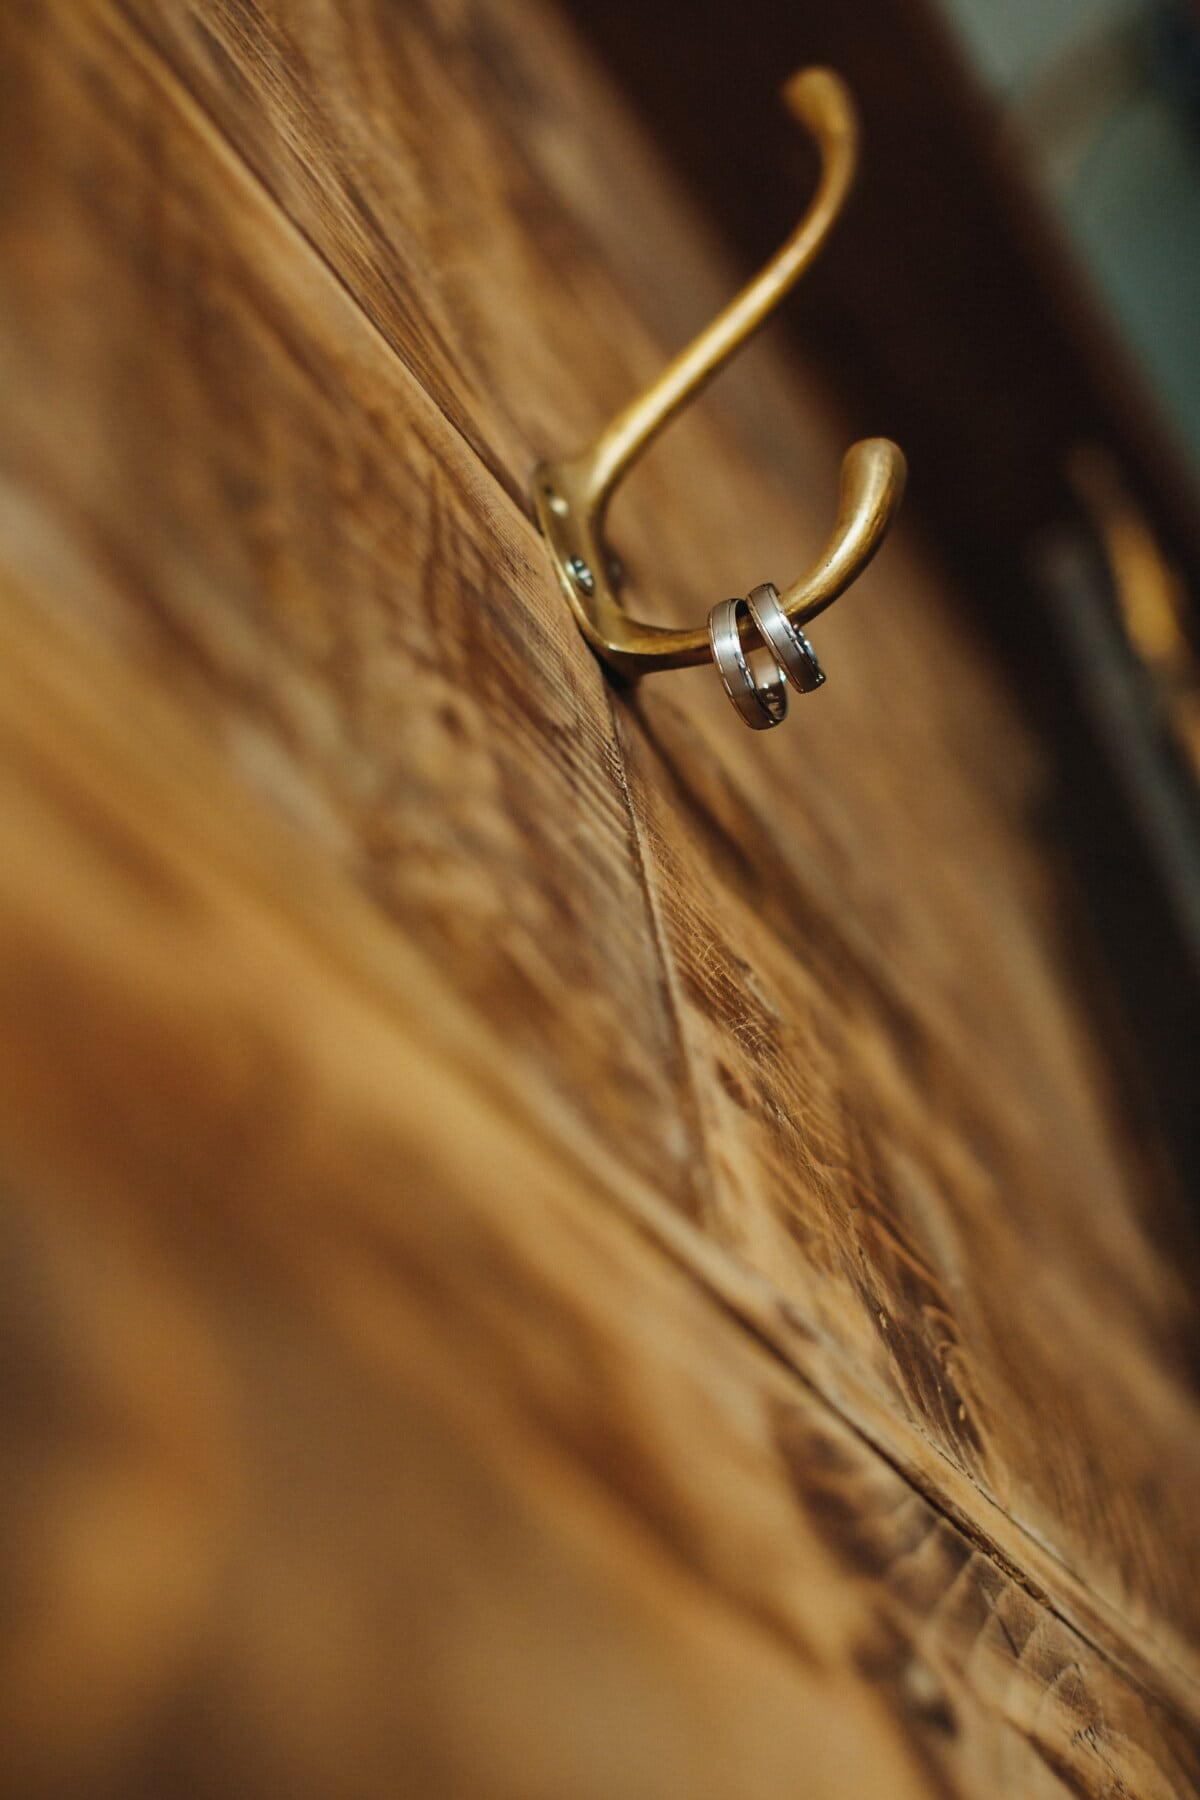 hanging, rings, brass, wall, hanger, wooden, carpentry, planks, wood, blur